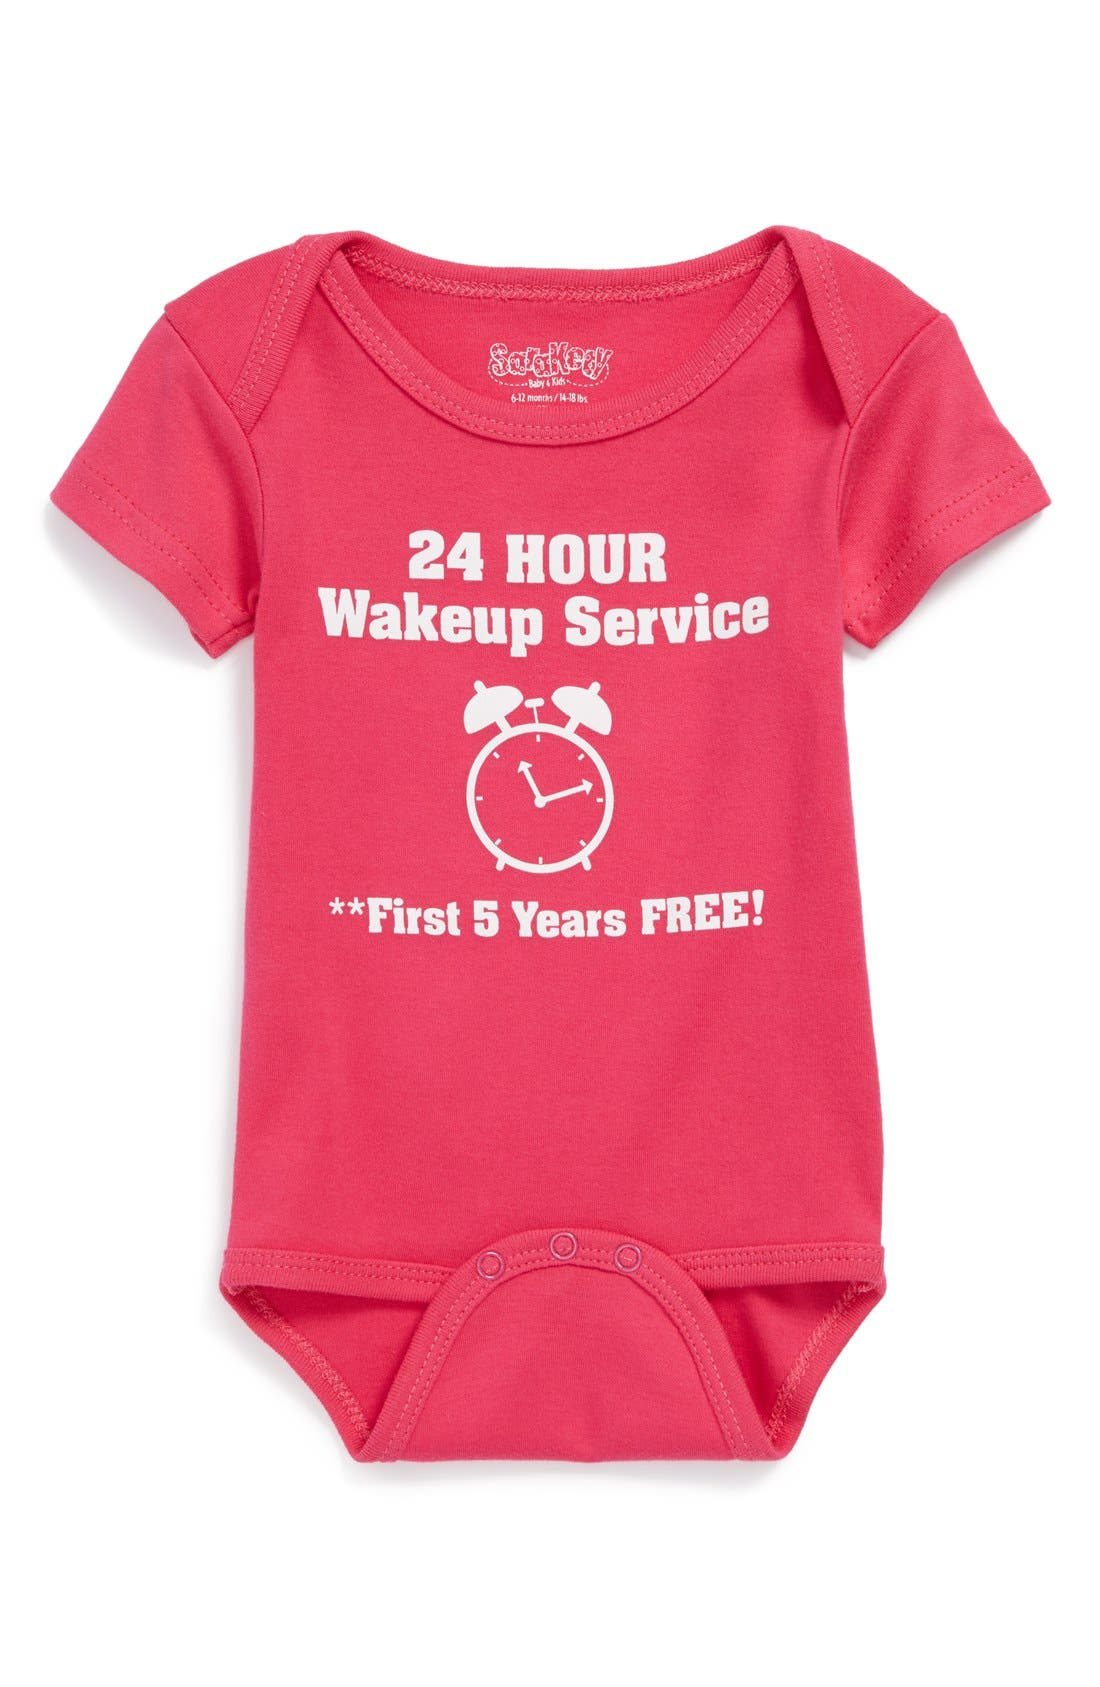 SARA KETY BABY & KIDS 'Wakeup Service' Bodysuit, Main, color, 674